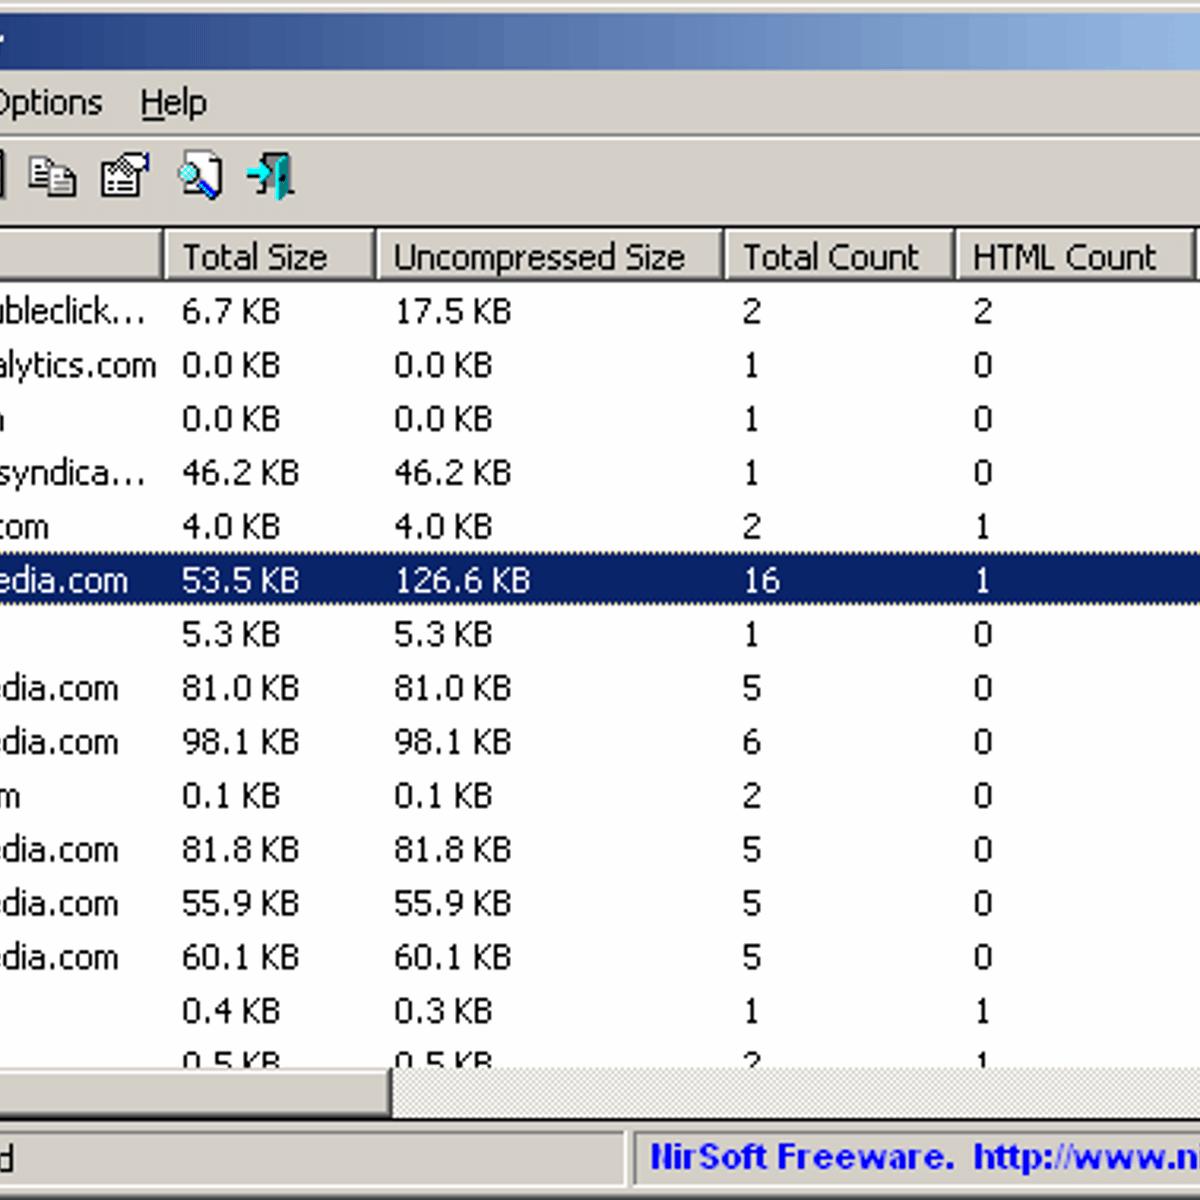 WebSiteSniffer Alternatives and Similar Software